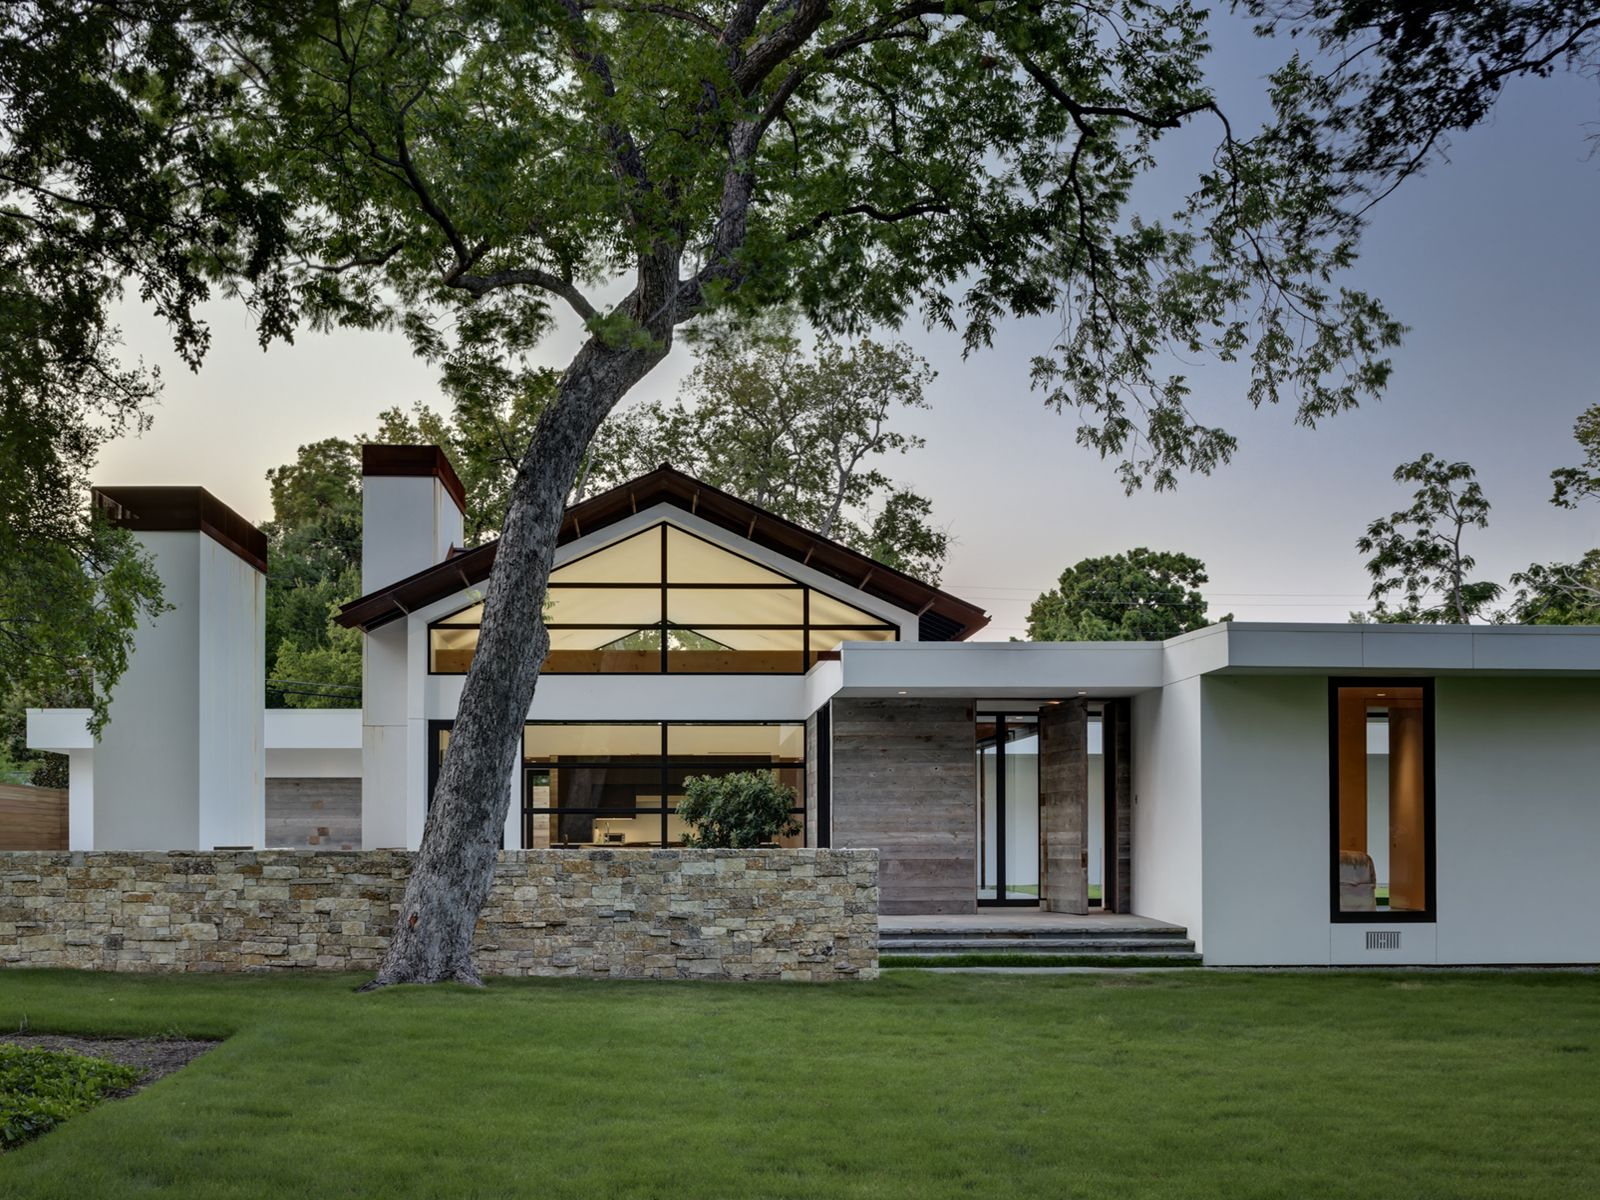 Fachada de casa moderna grande construye hogar - Construye hogar ...